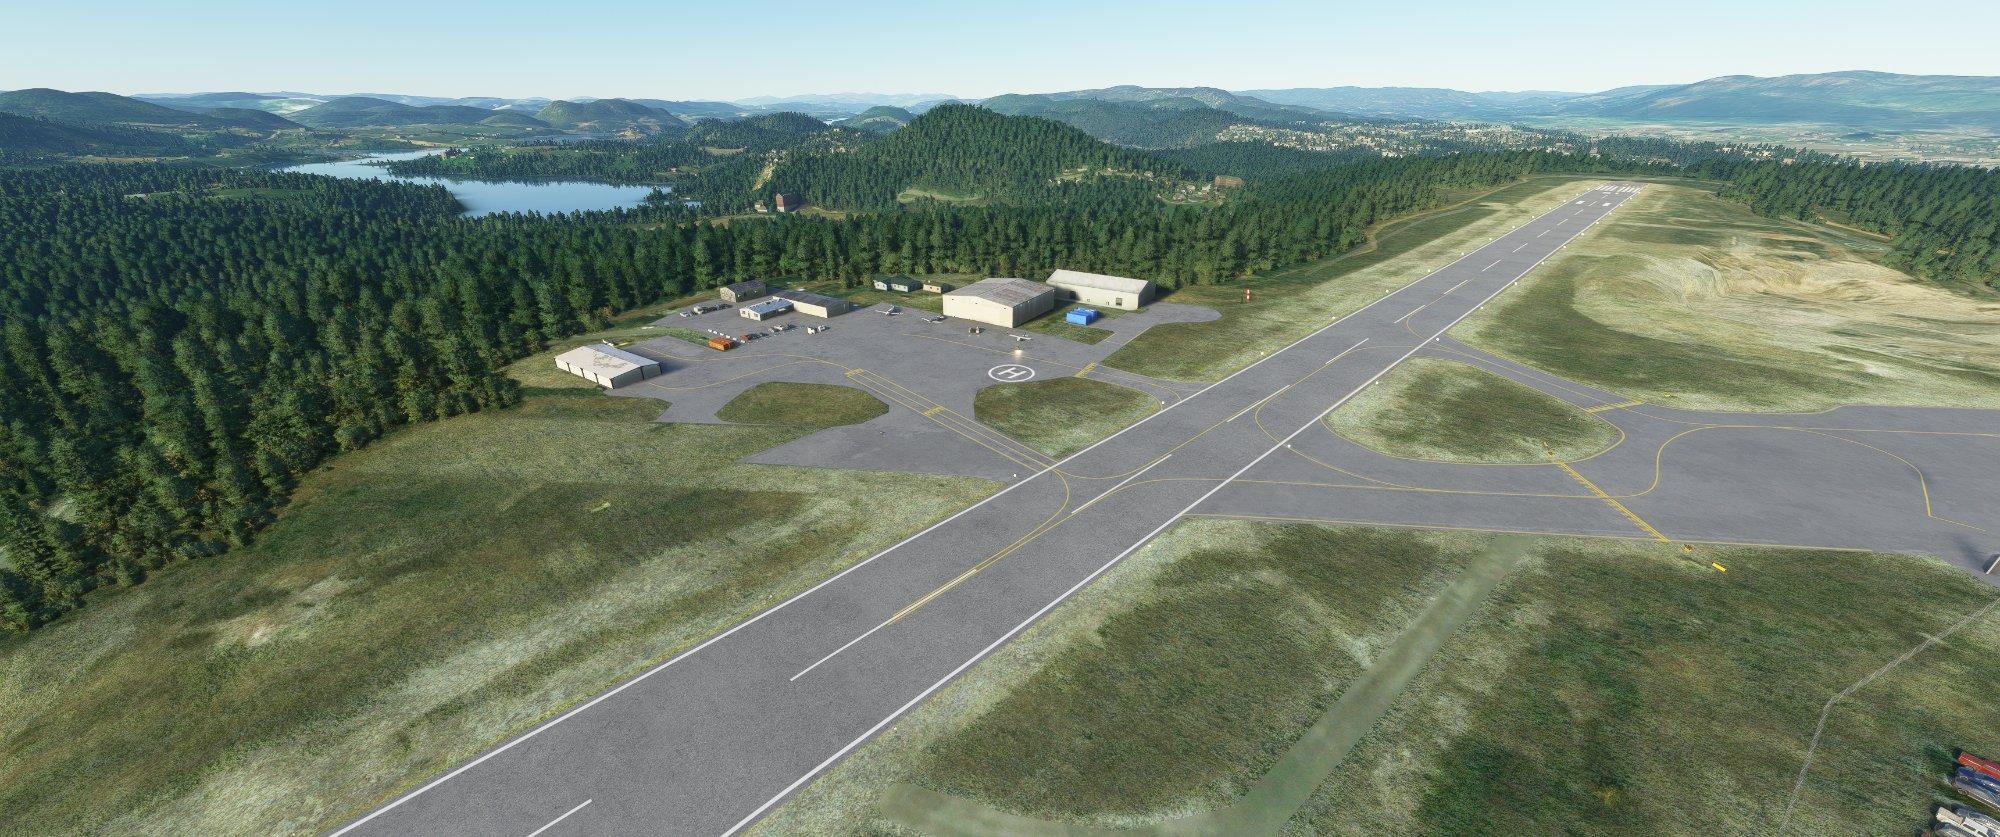 Microsoft Flight Simulator Screenshot 2020.10.30 - 16.25.58.78.jpg